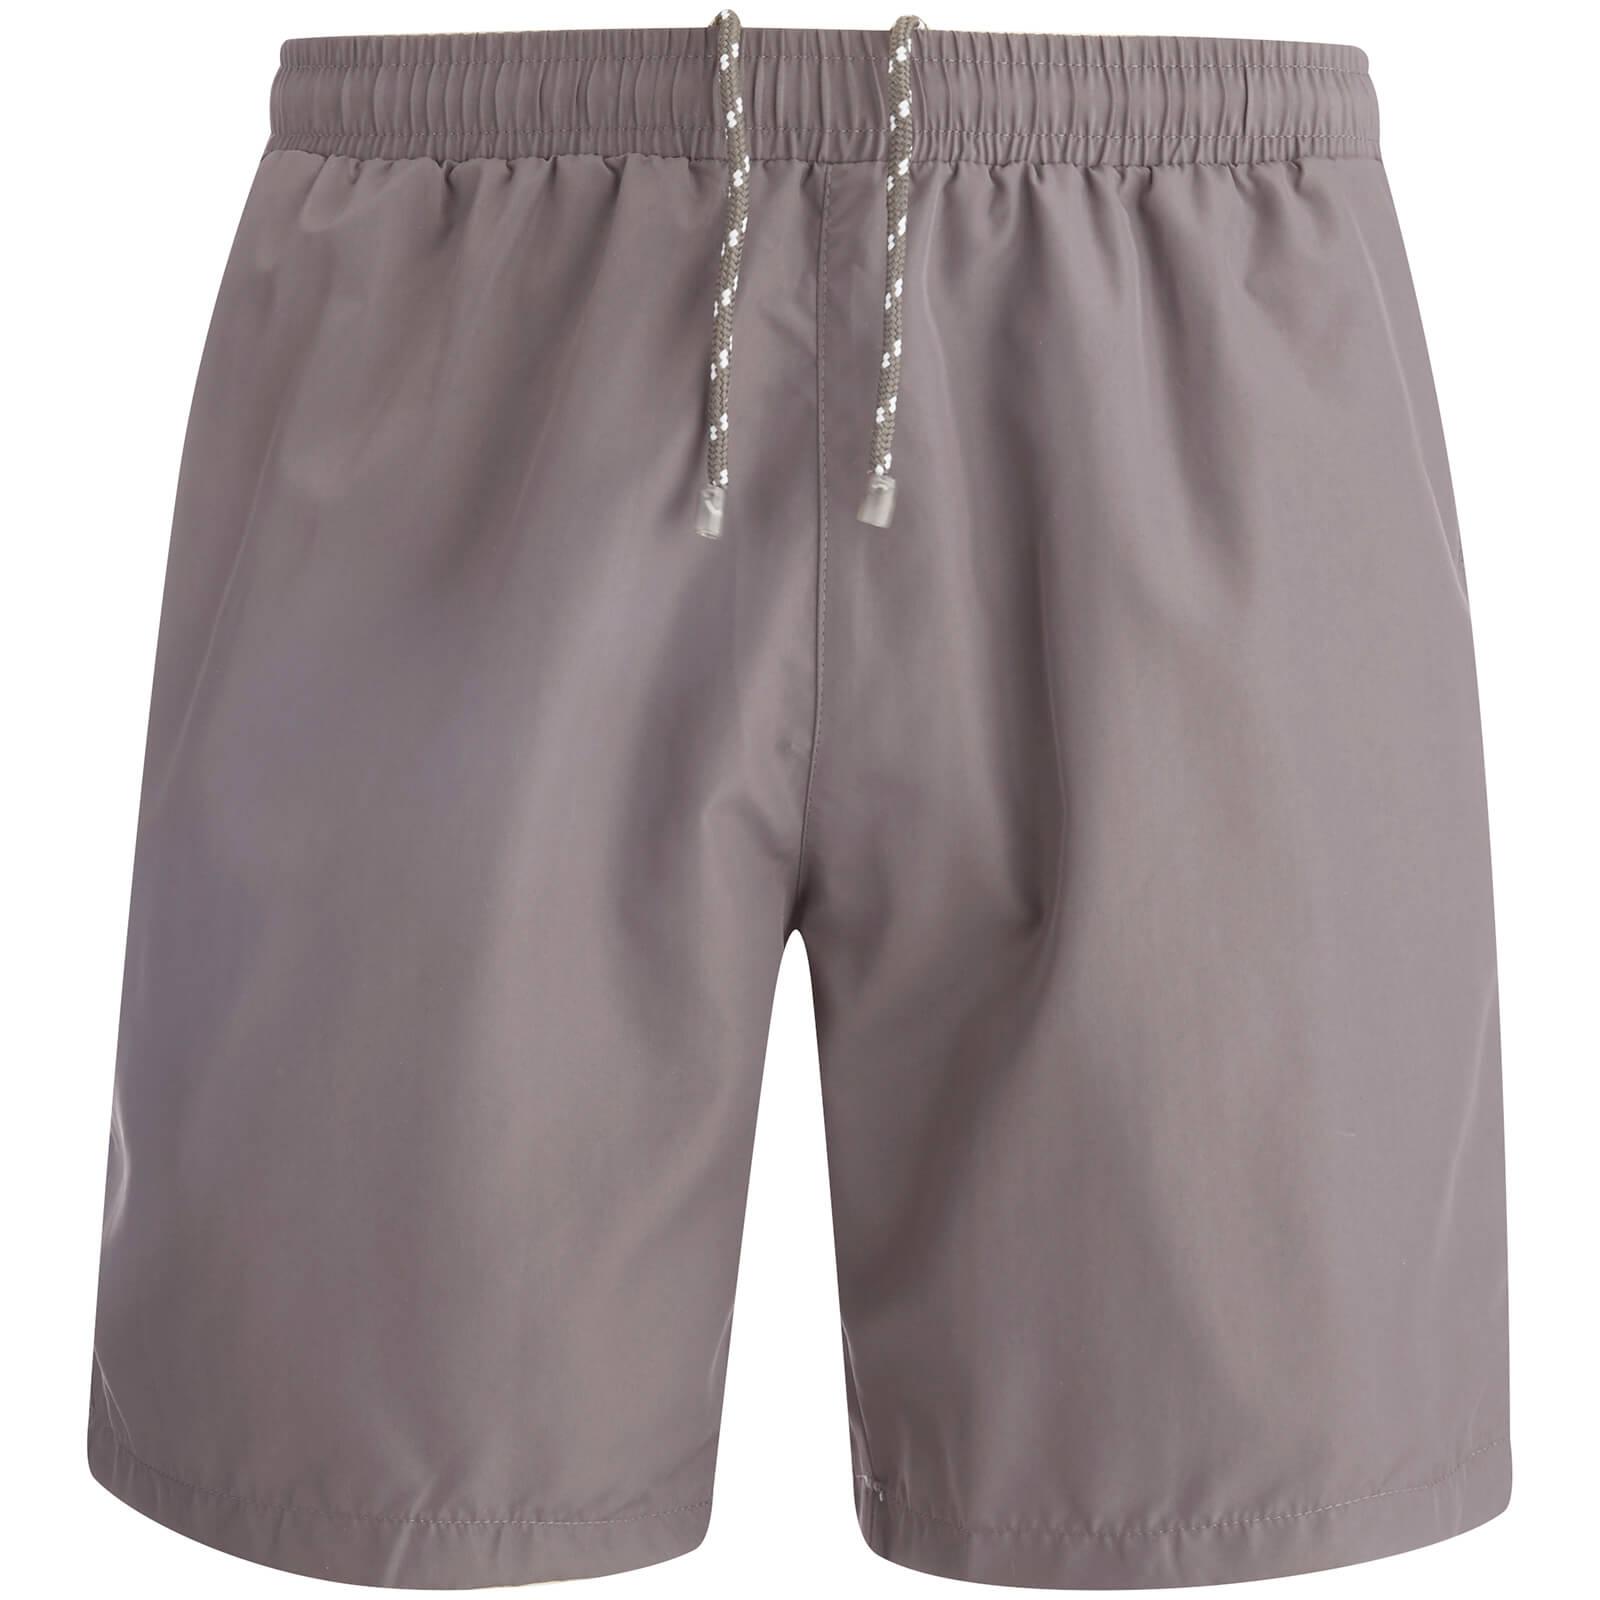 8b8dccfdb0e78 BOSS Hugo Boss Men's Seabream Swim Shorts - Dark Grey - Free UK Delivery  over £50